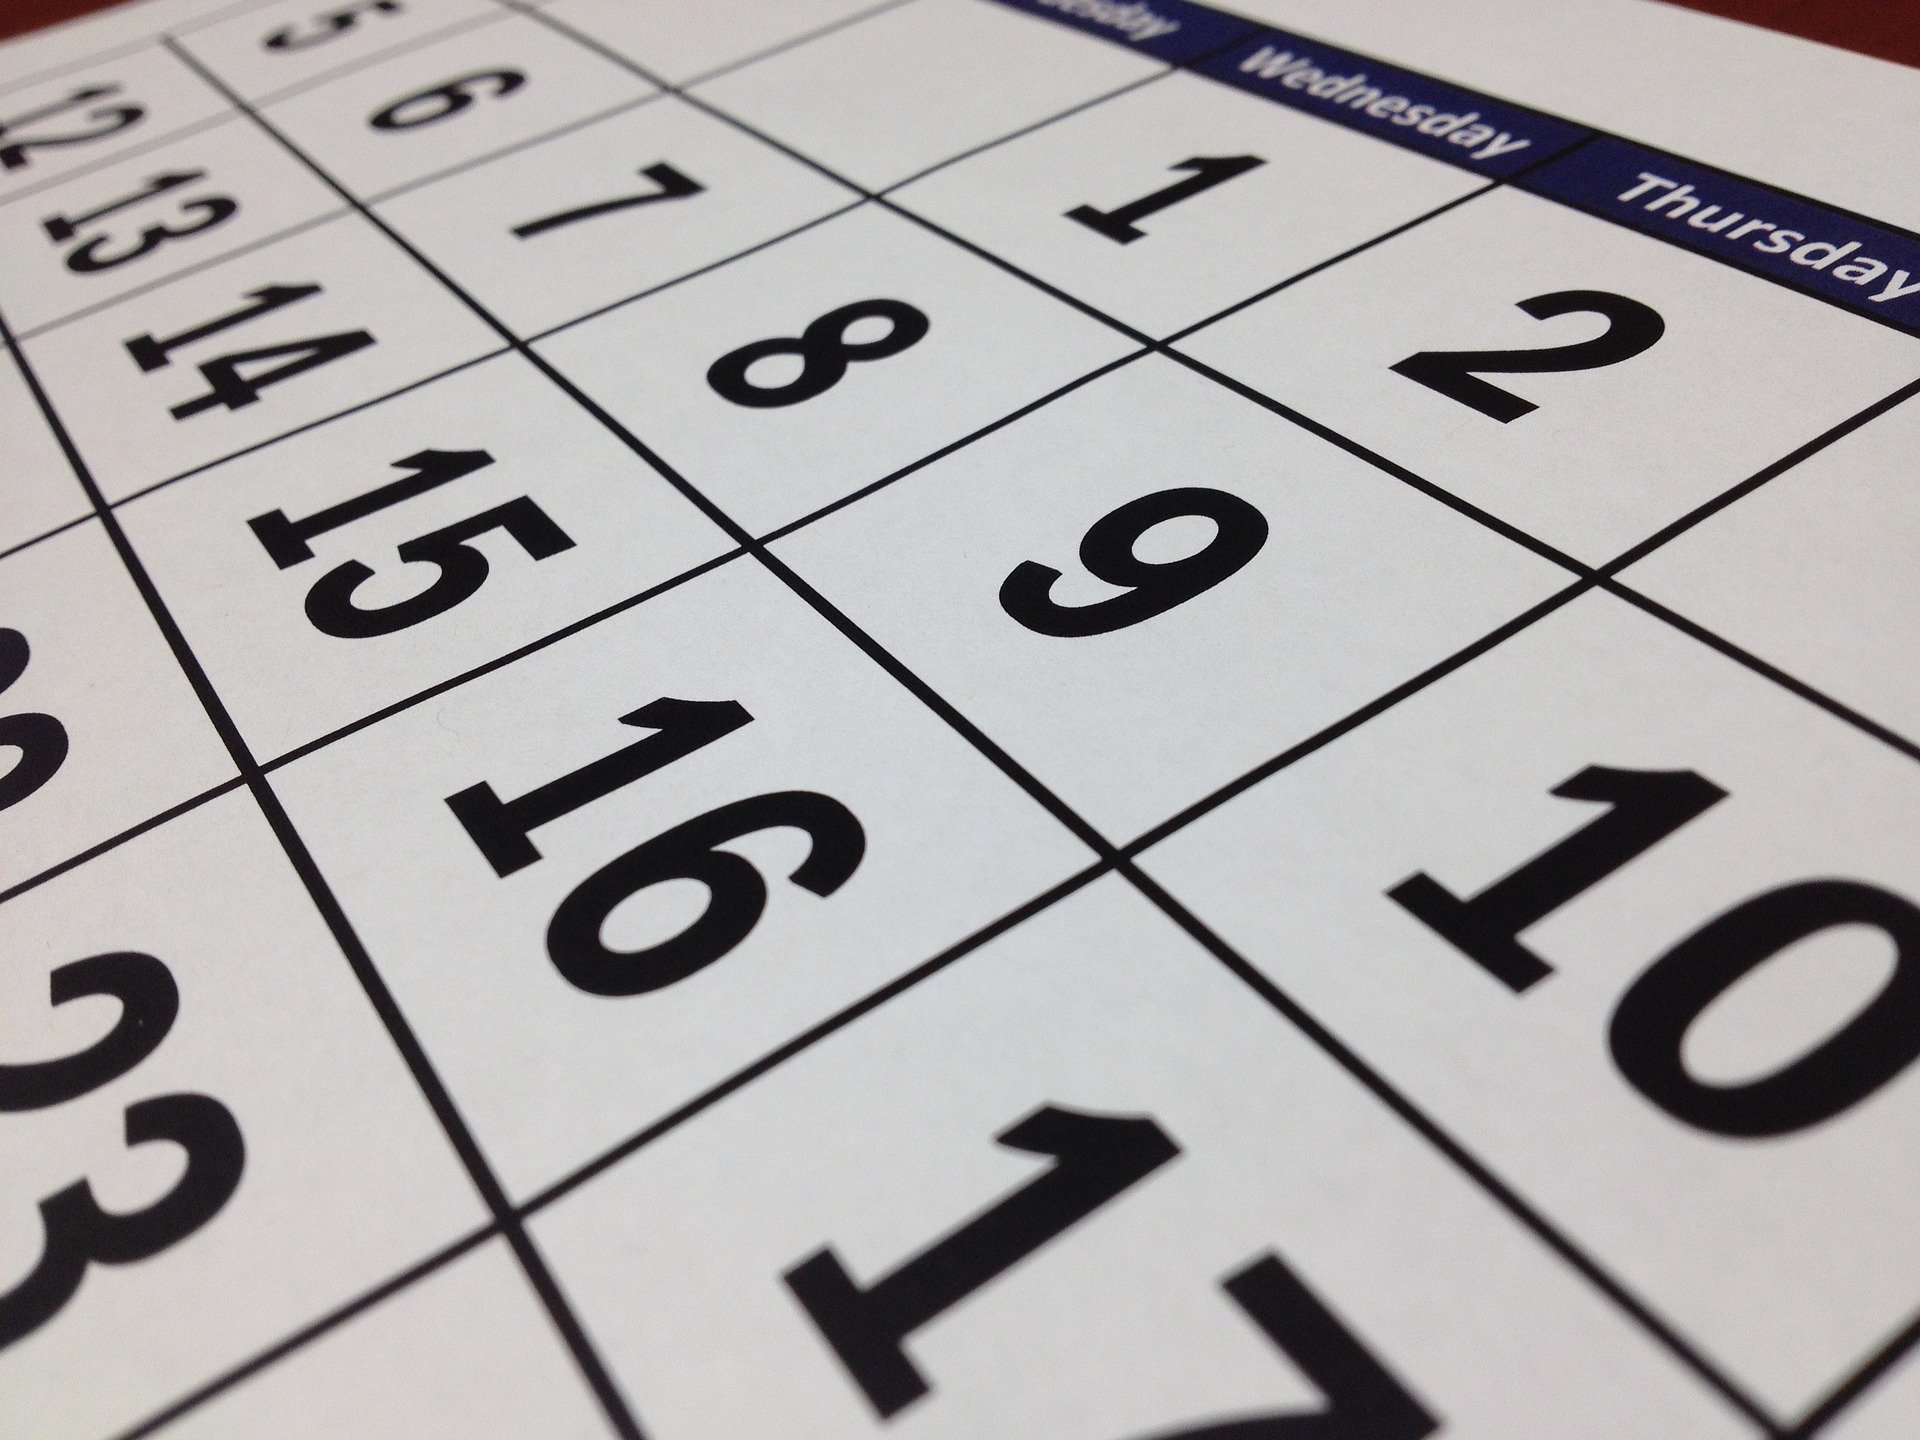 image of large calendar showing dates